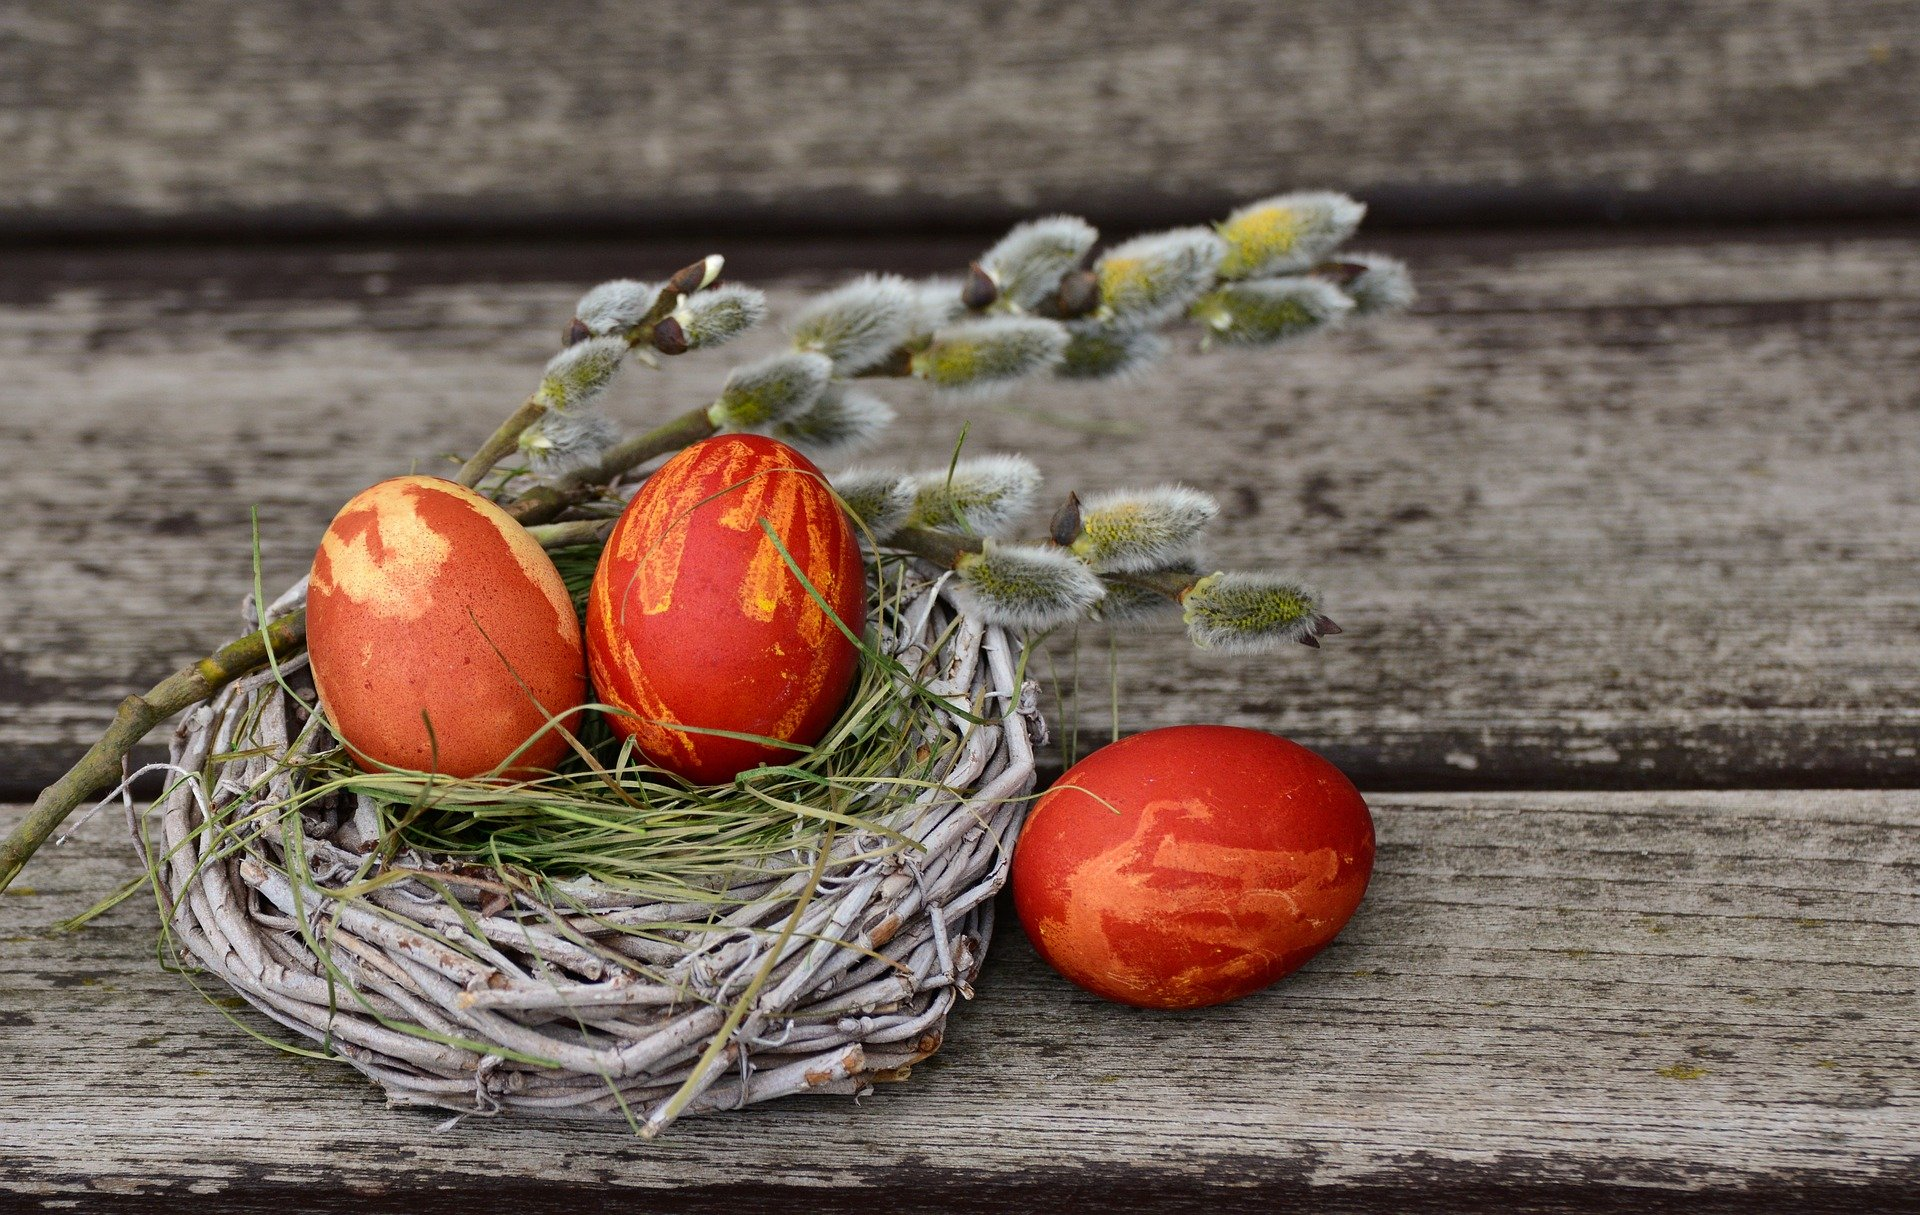 Sretan Uskrs želi Vam SDLSN!